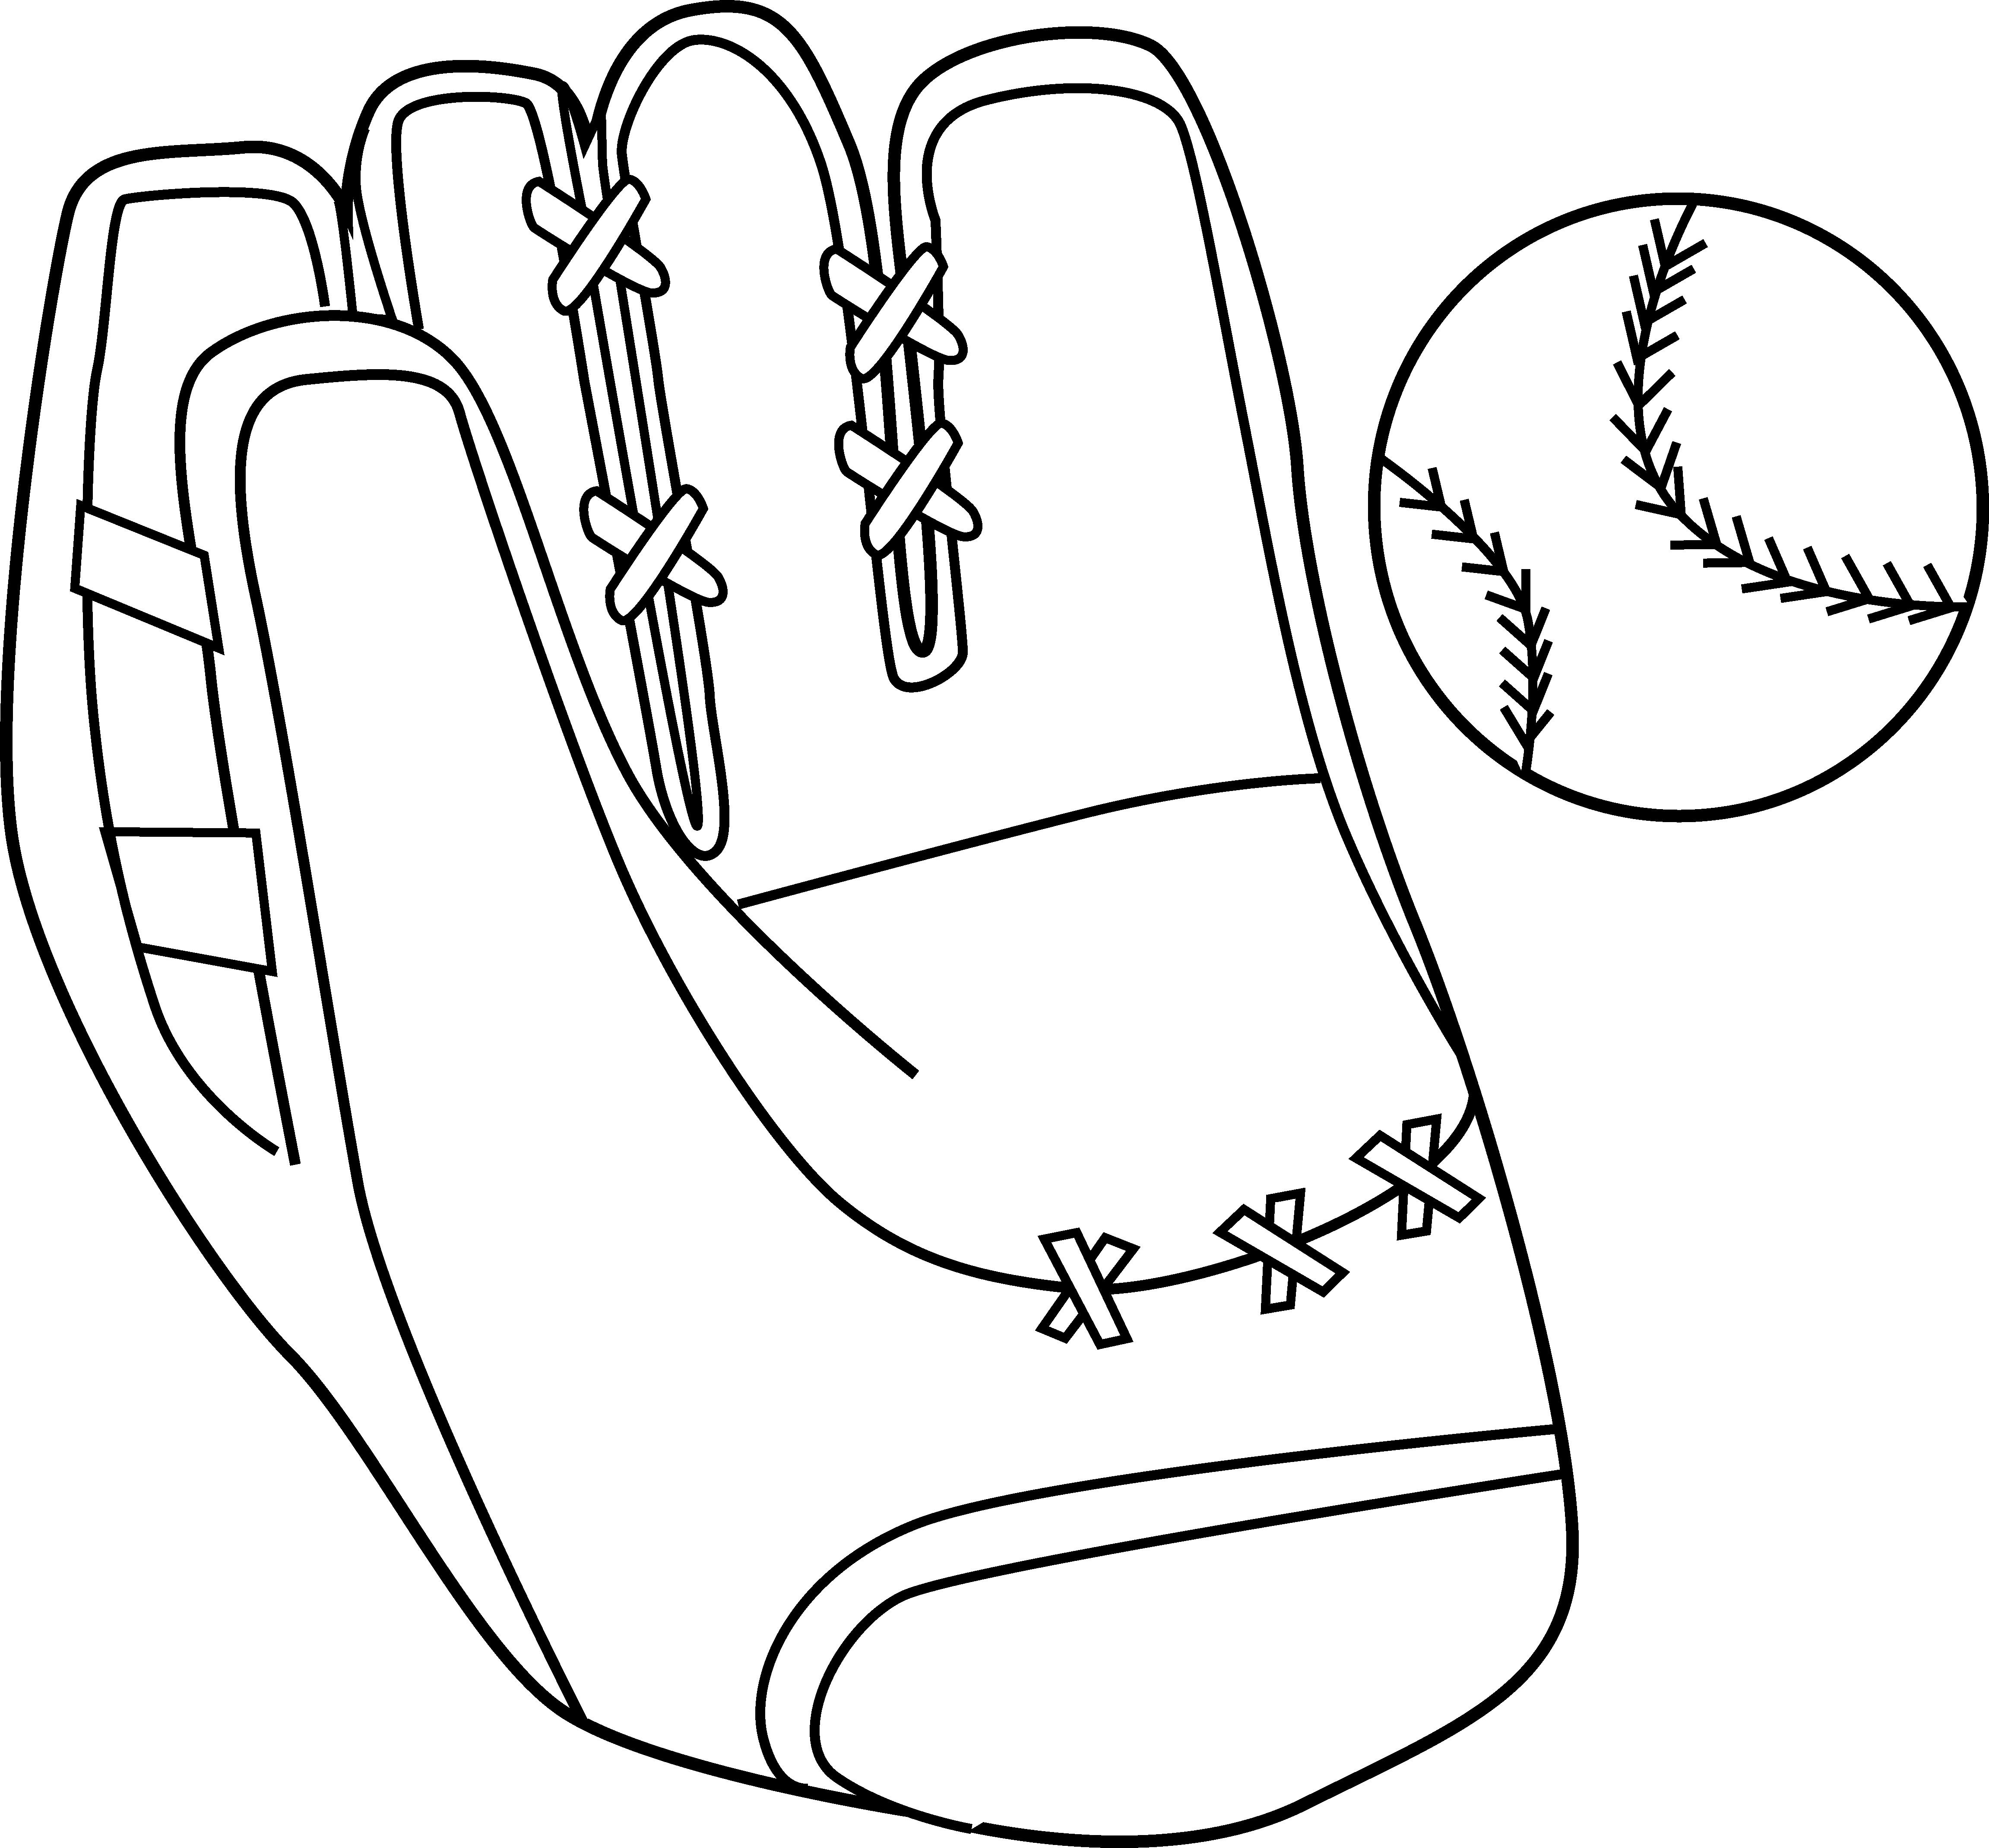 4606x4280 Baseball Mitt And Ball Coloring Page